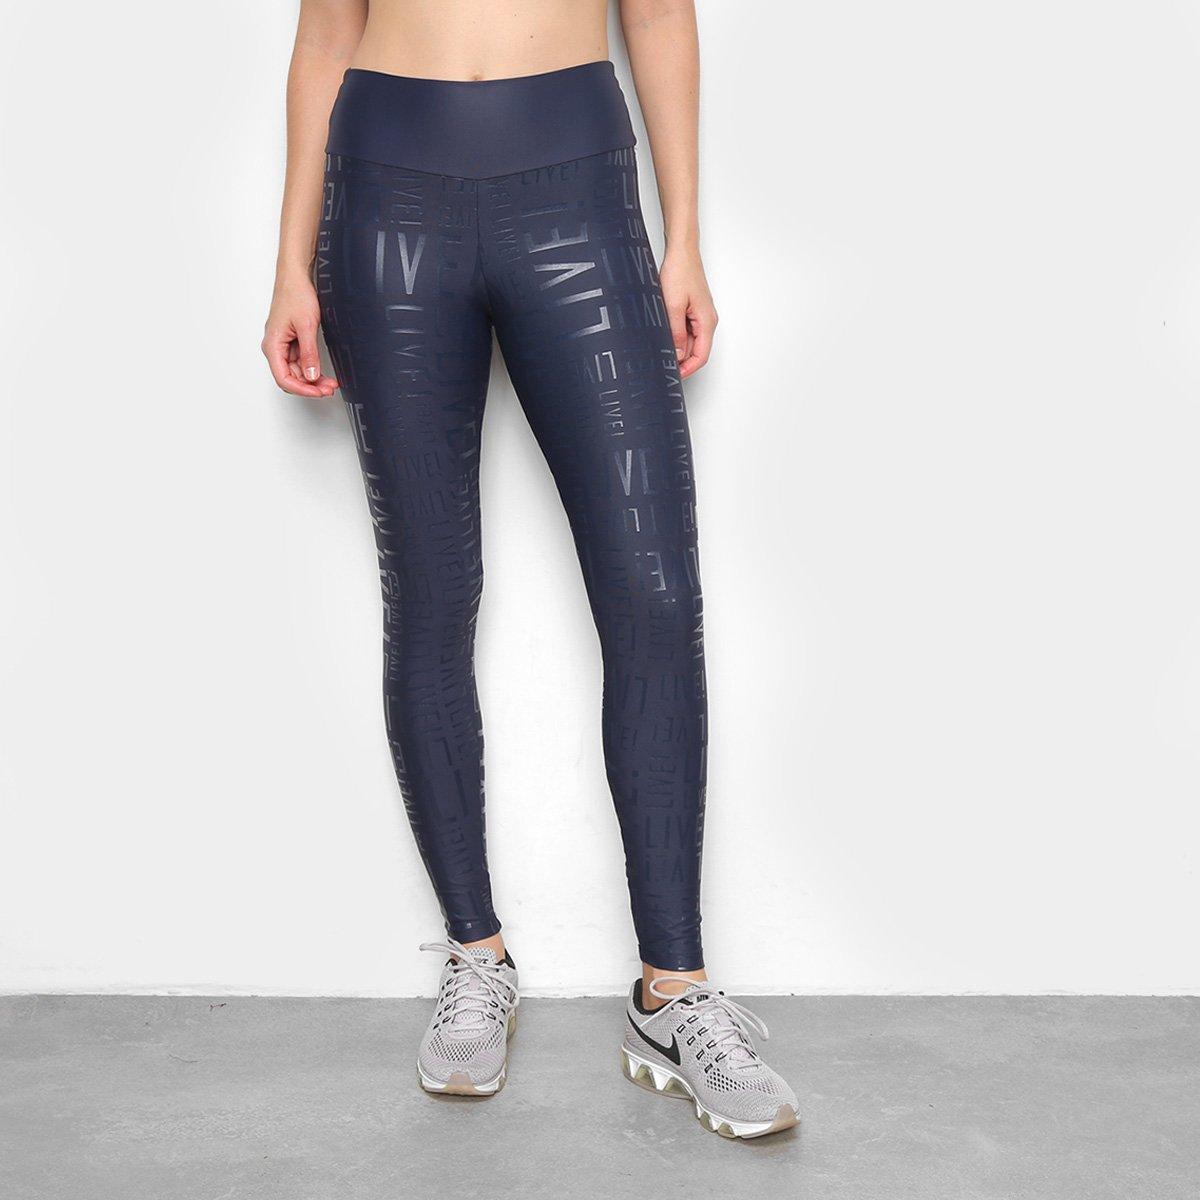 Calça Legging Live! Essential  Feminina